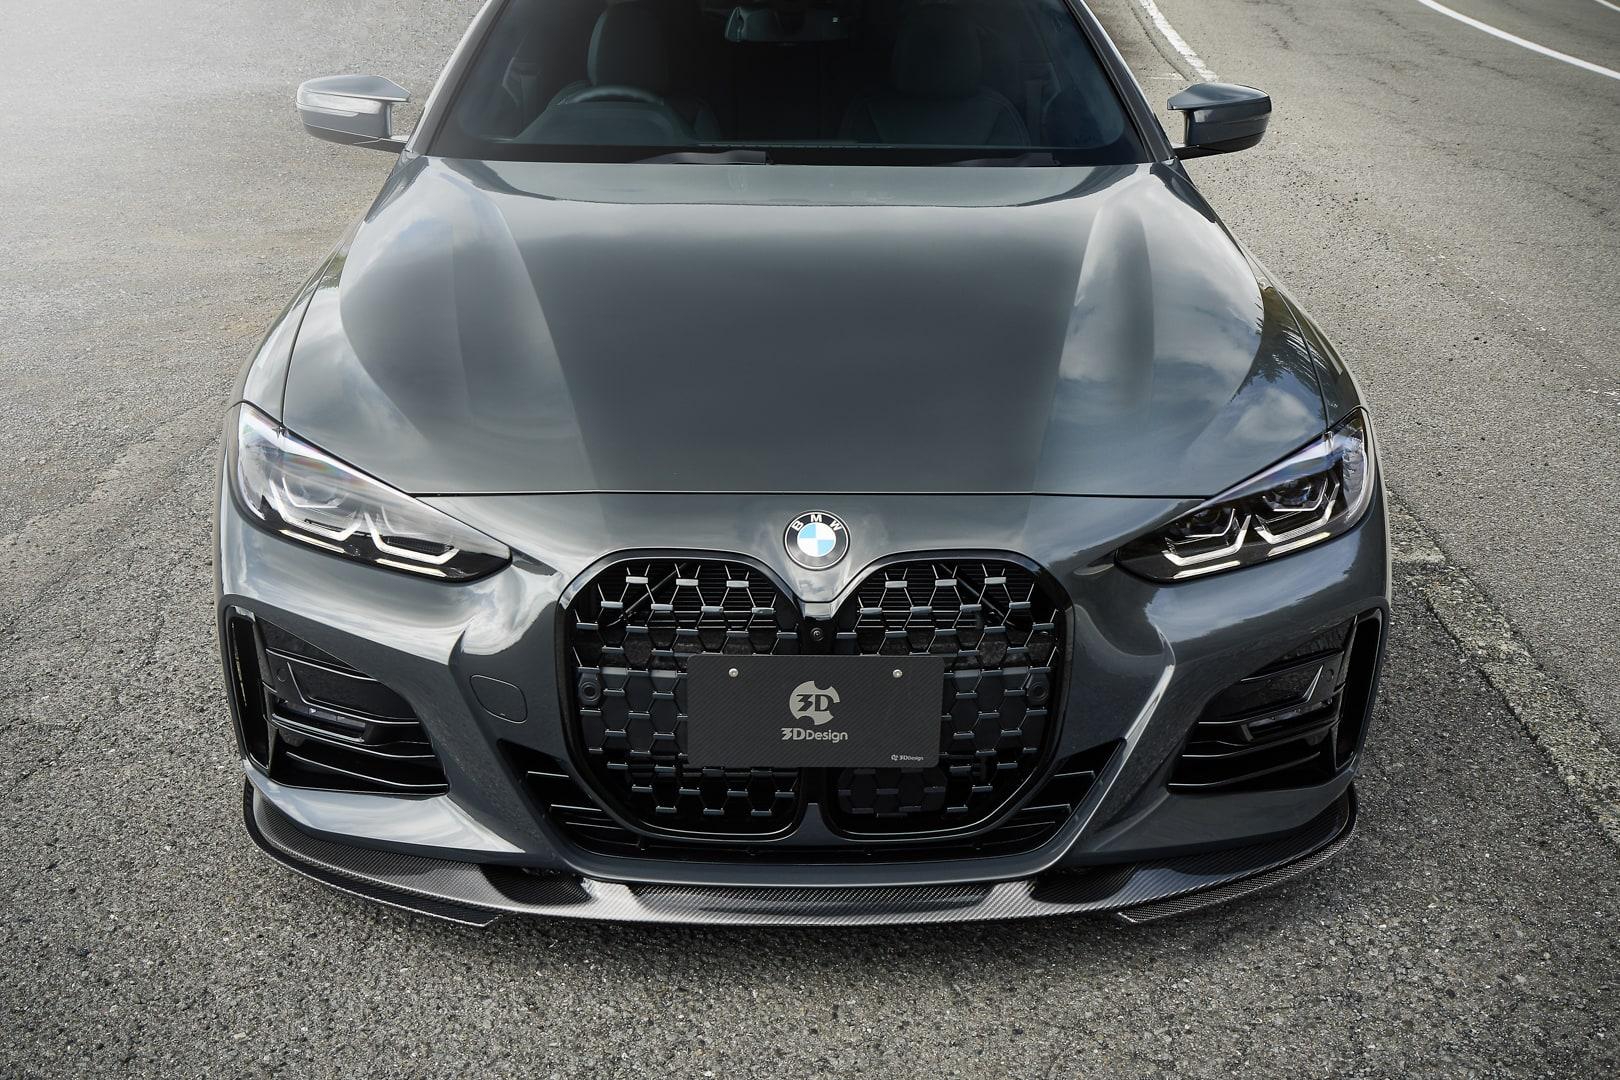 BMW-4-Series-by-3D-Design-22